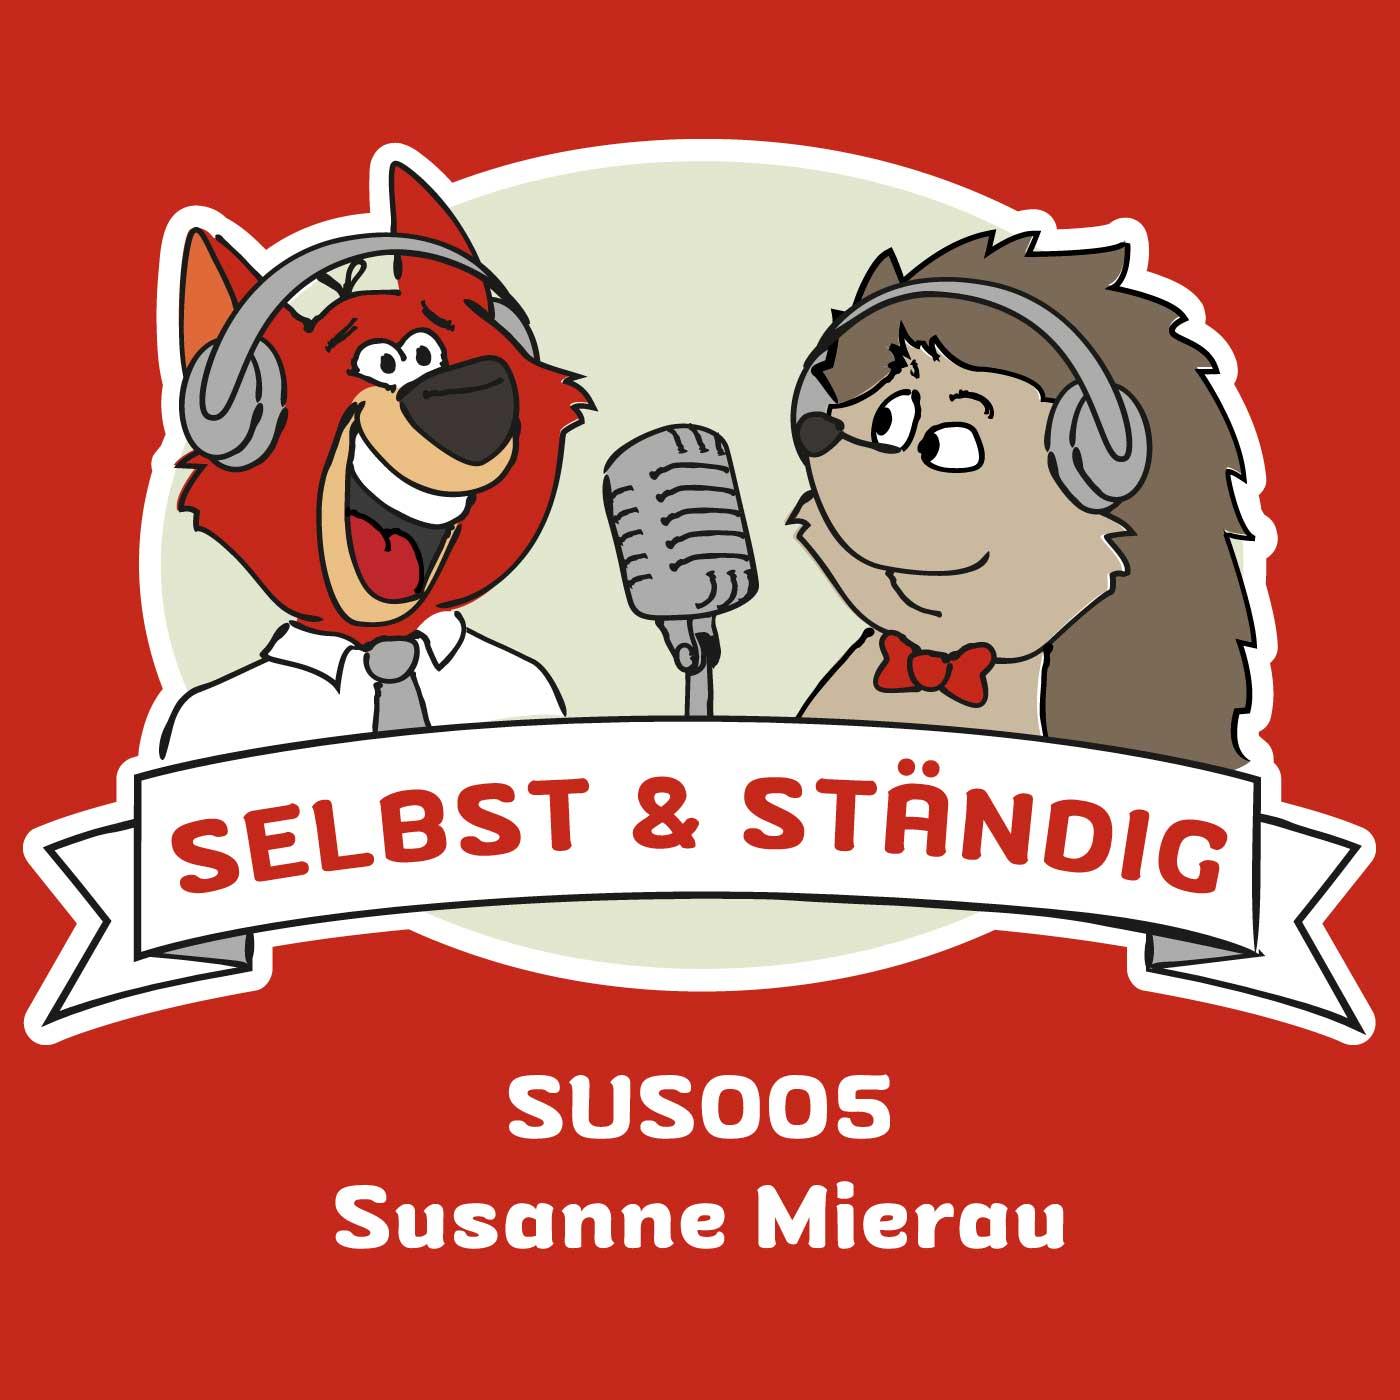 SUS005 Susanne Mierau